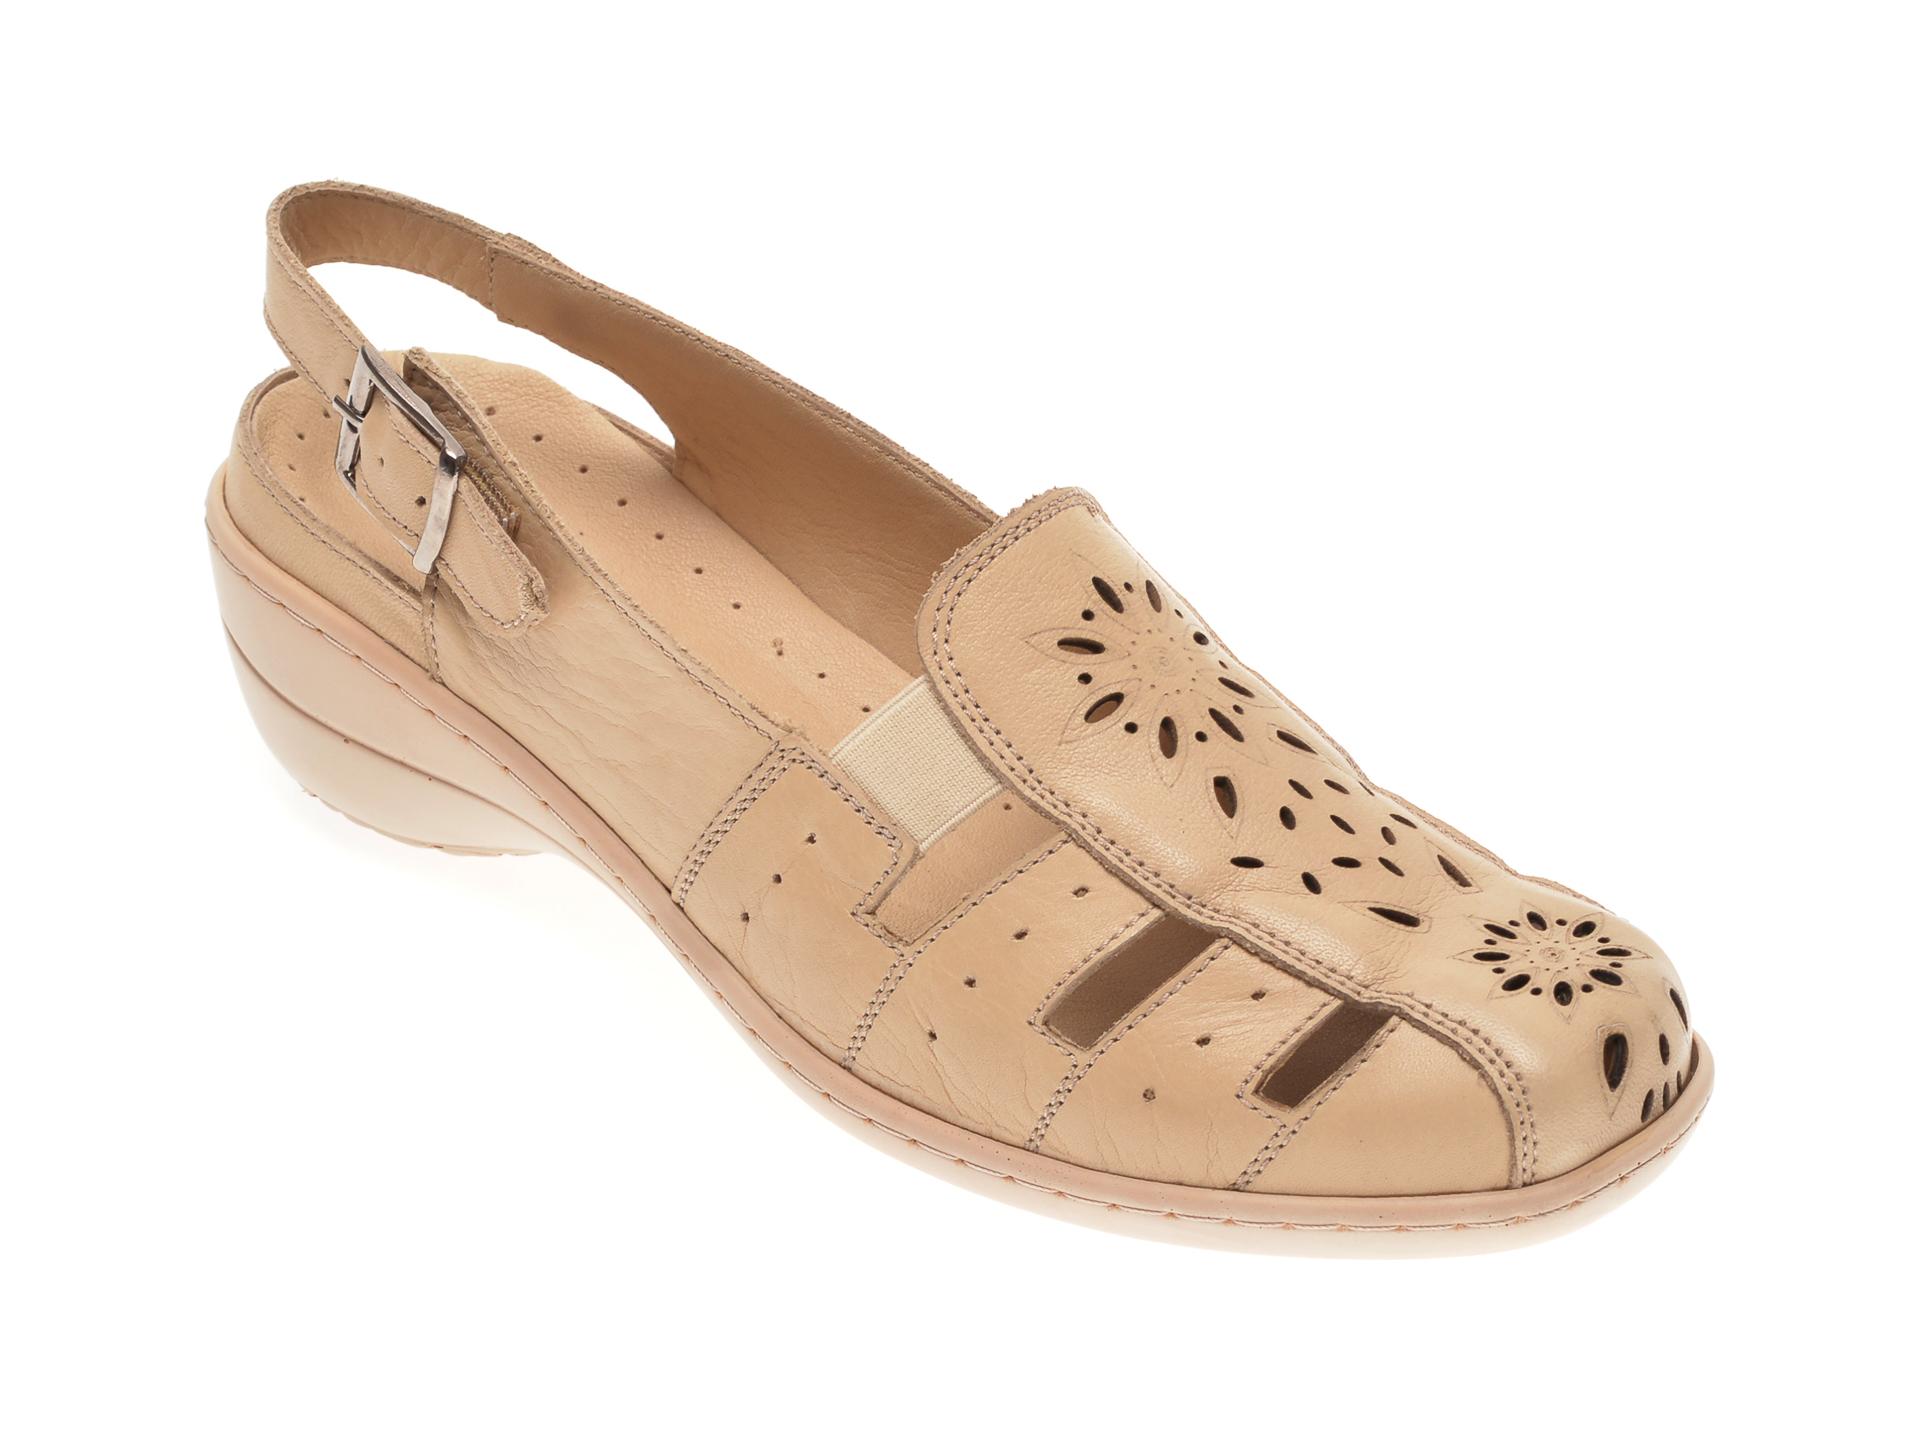 Pantofi LUMEL bej, 202, din piele naturala